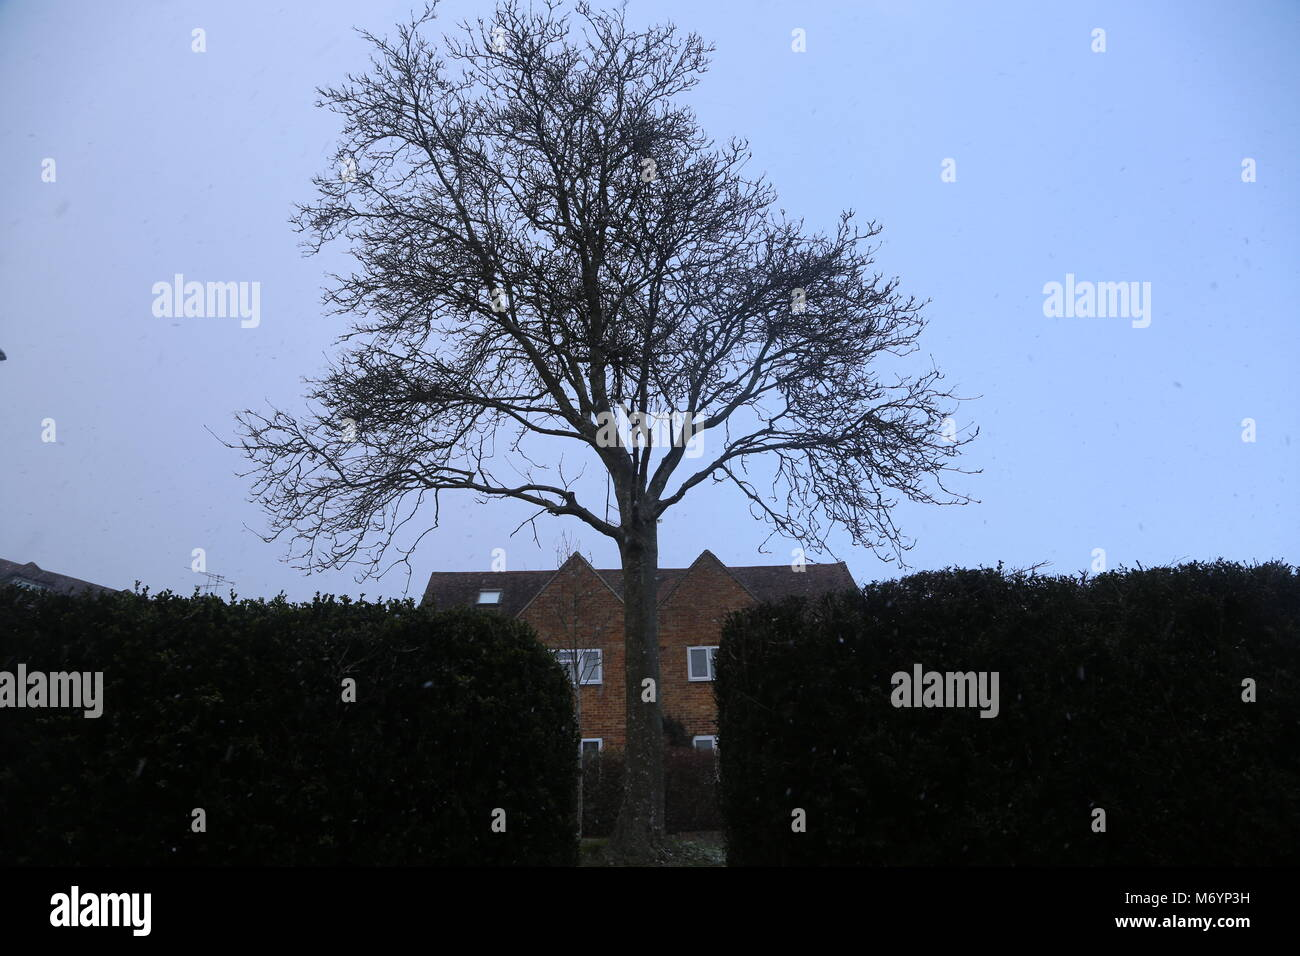 Snowy tree on doorstep - Stock Image